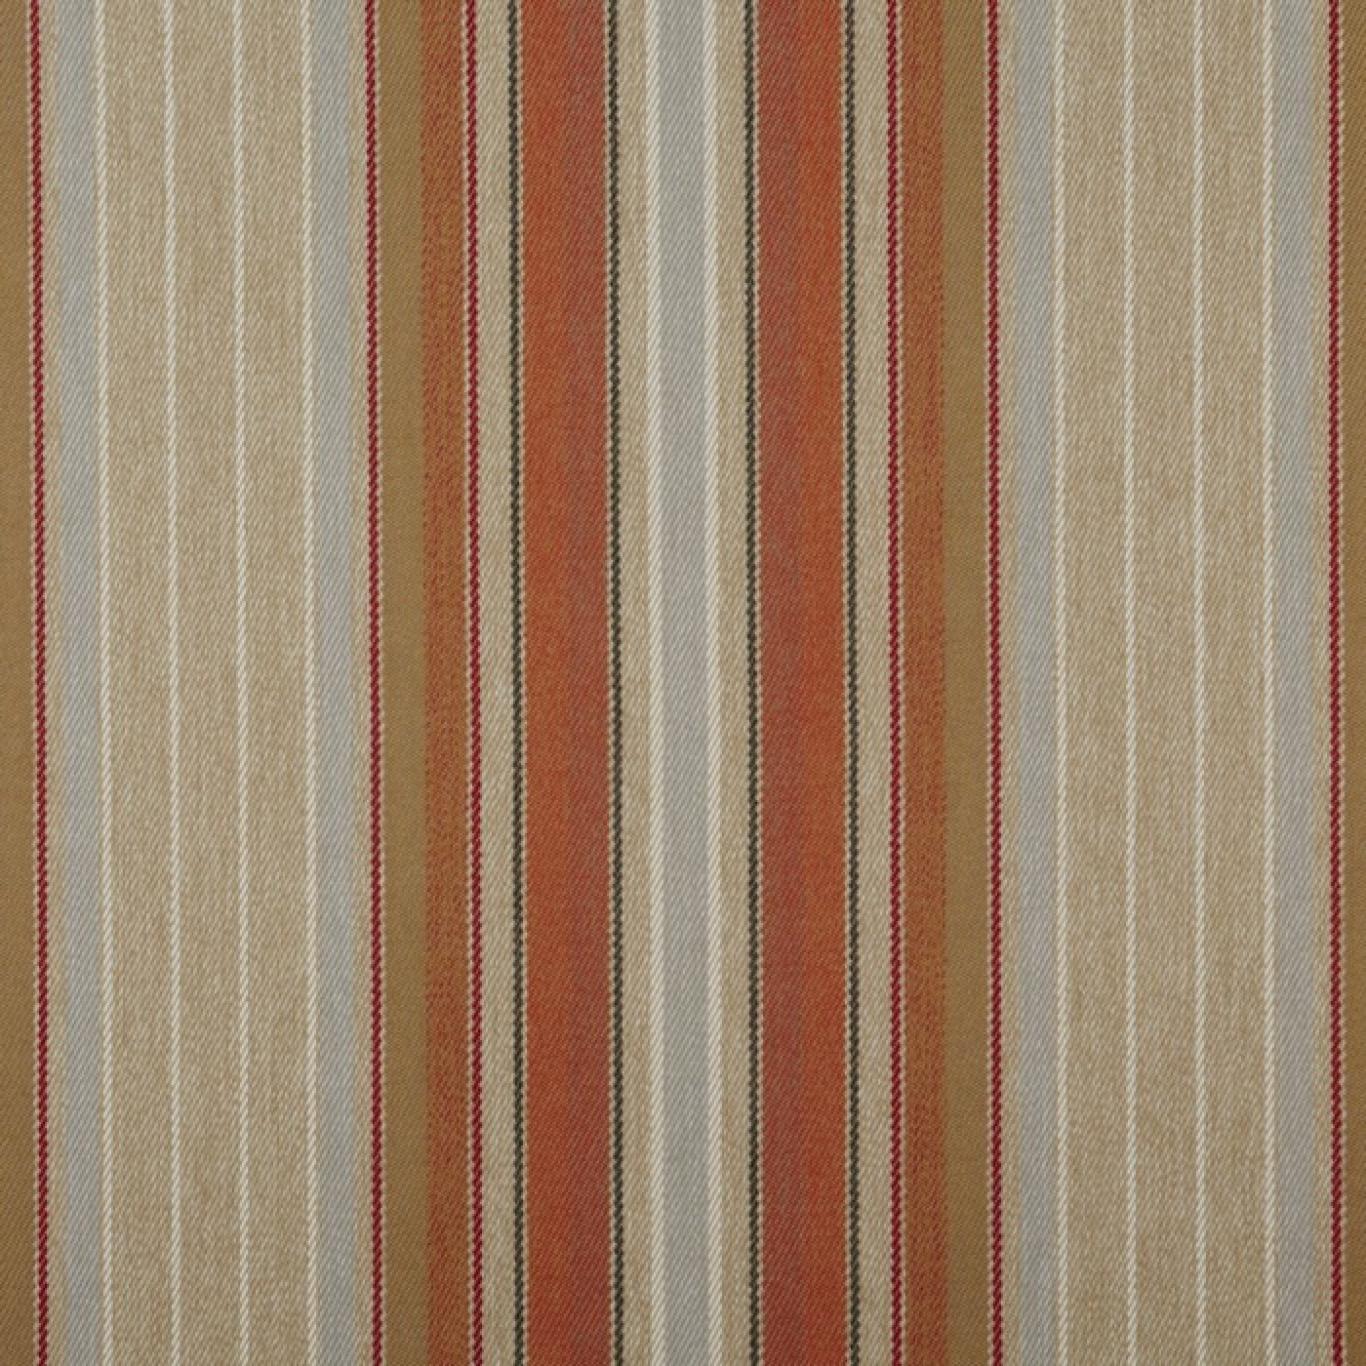 Image of Prestigious Braemar Auburn Fabric